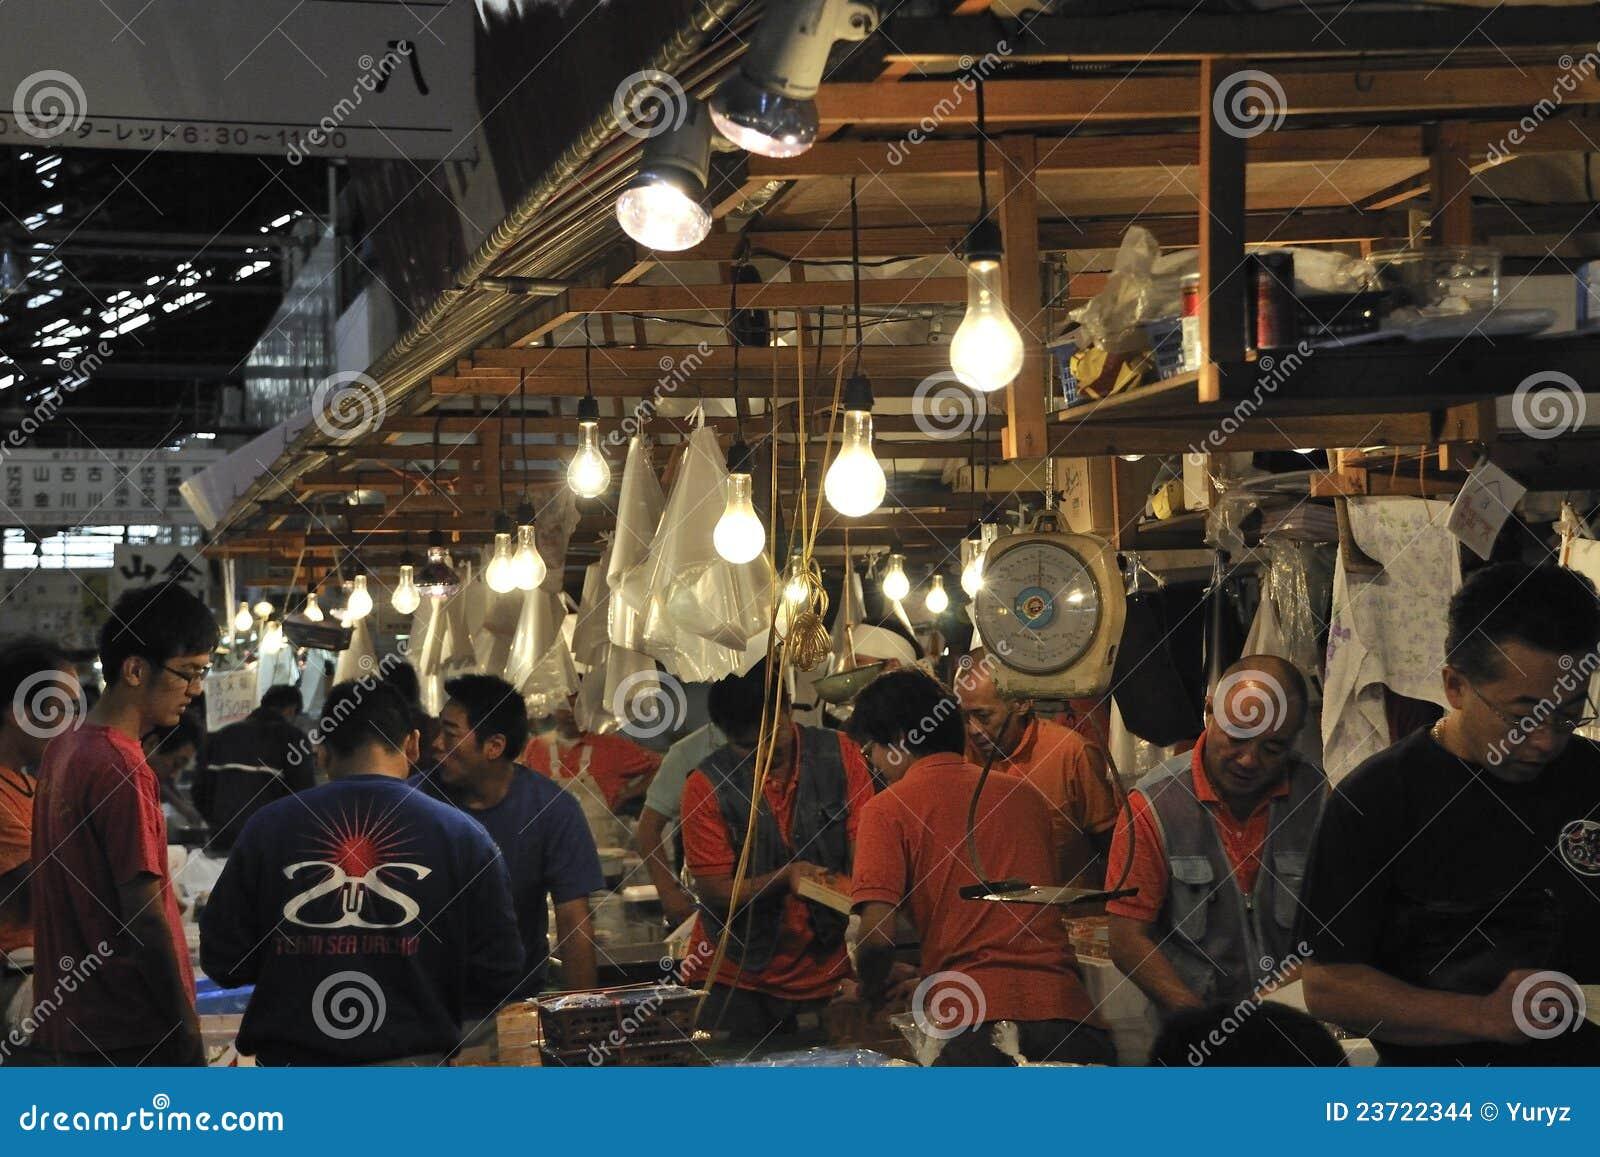 Tsukiji fish market editorial stock image image 23722344 for Tsukiji fish market chicago